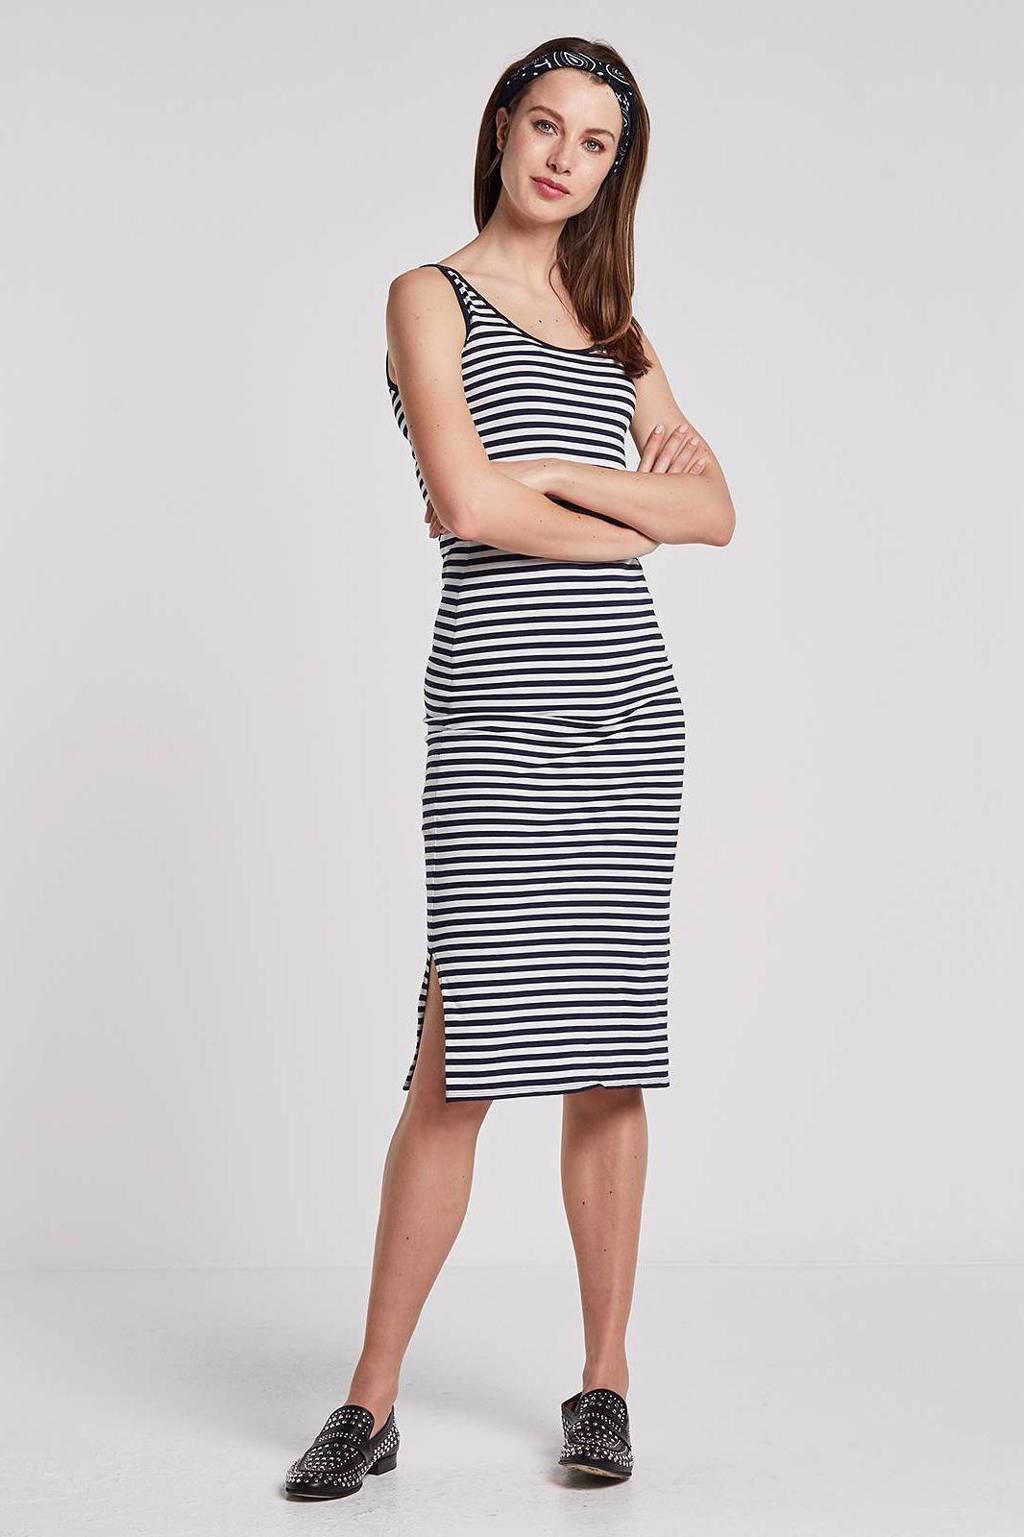 G-Star RAW Liffy jurk, Wit/blauw